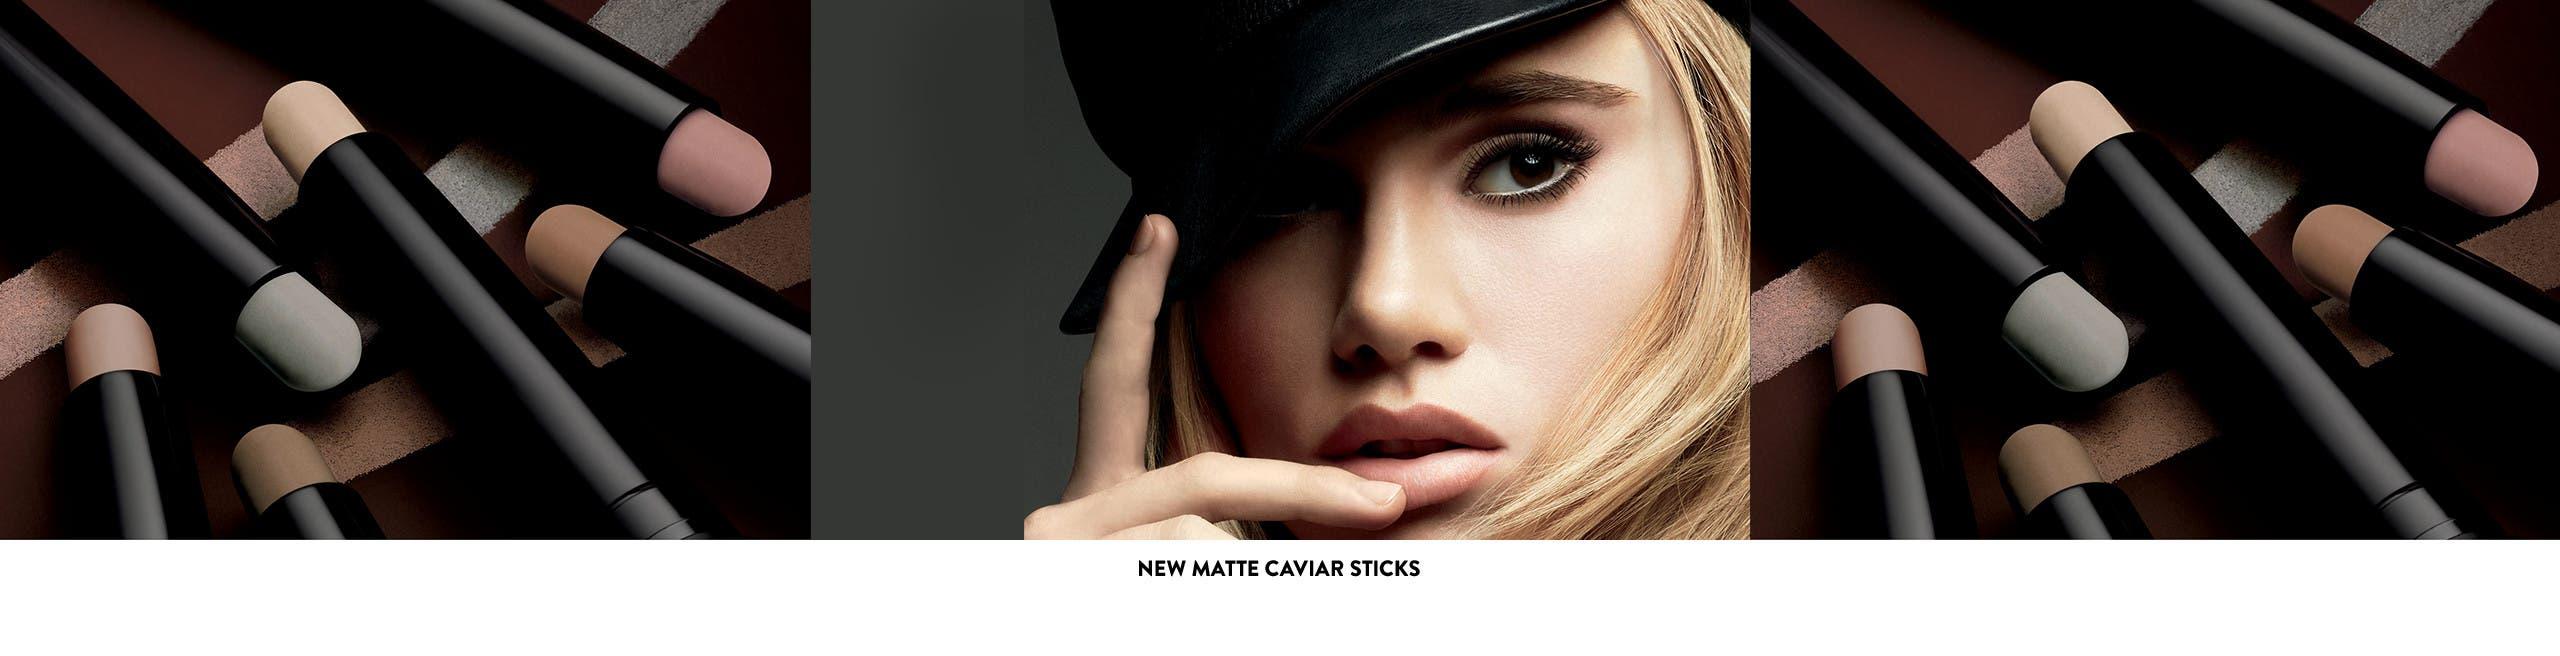 New Laura Mercier Matte Caviar Sticks.